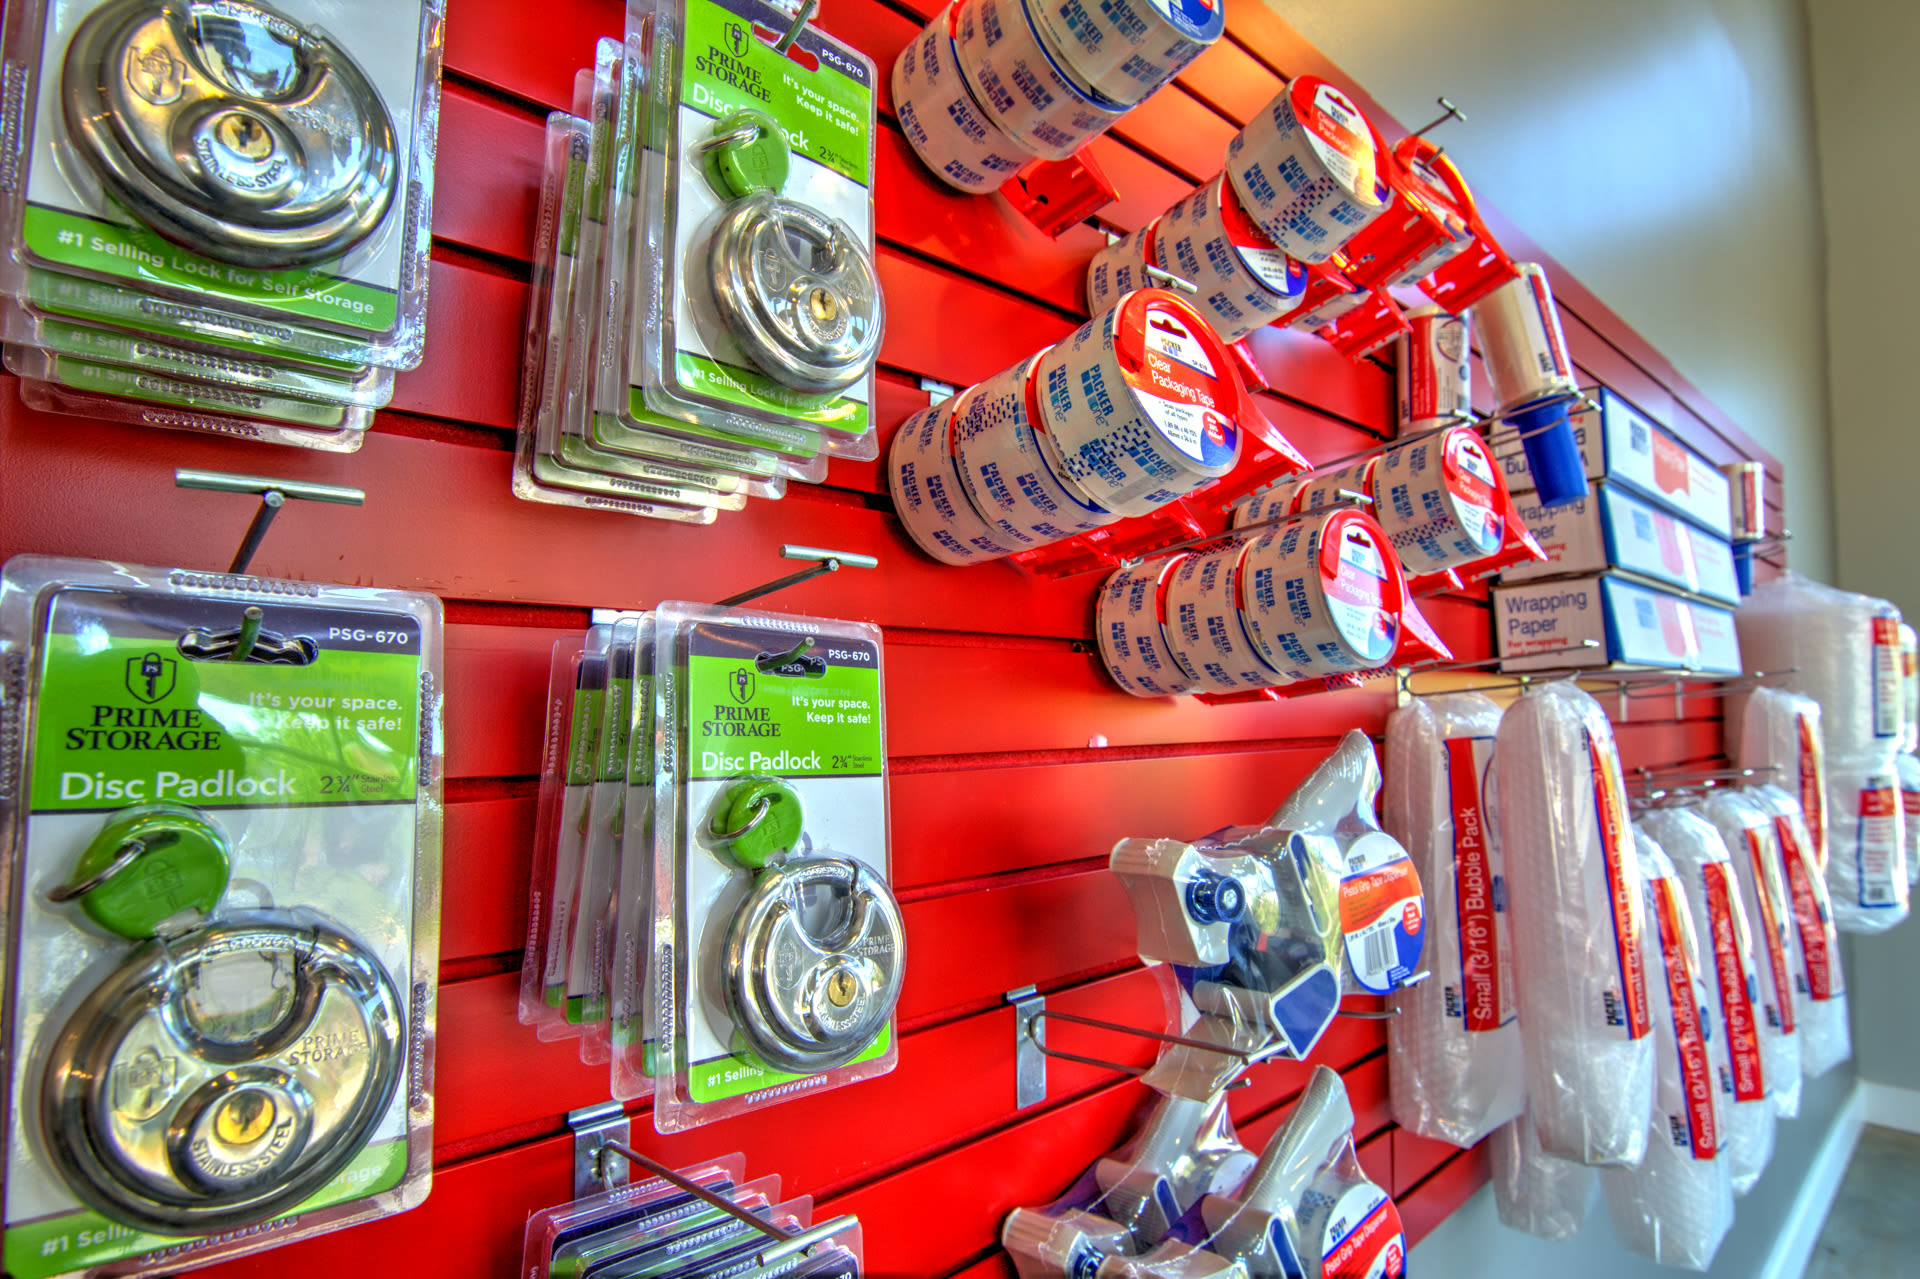 Prime Storage sells locks in Virginia Beach, VA